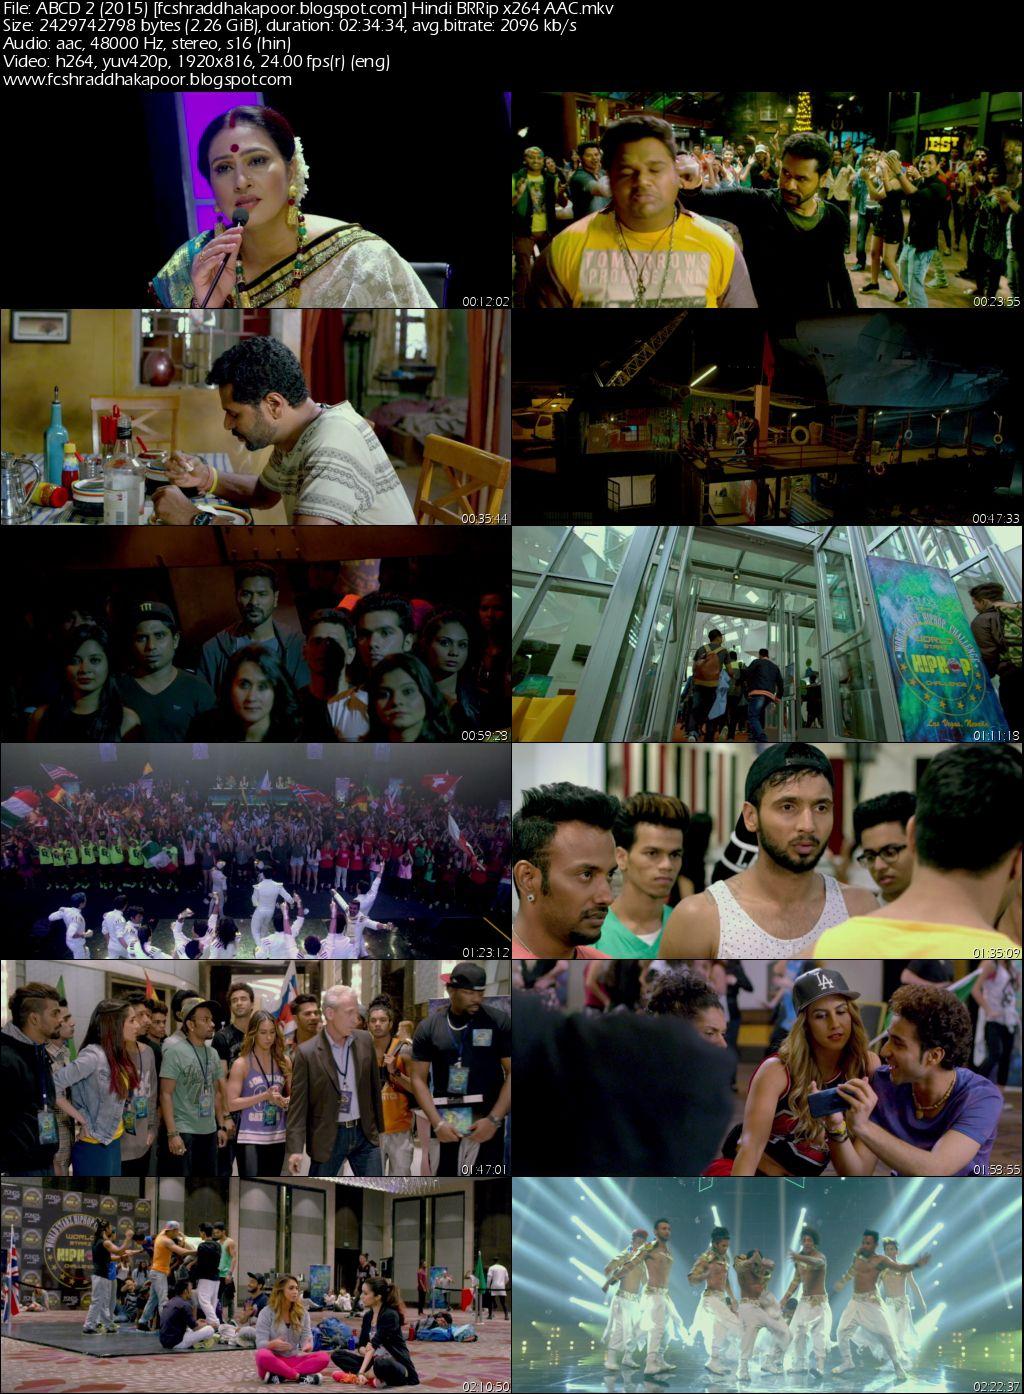 ABCD 2 2015 BRRip Full Hindi Movie Download 1080p